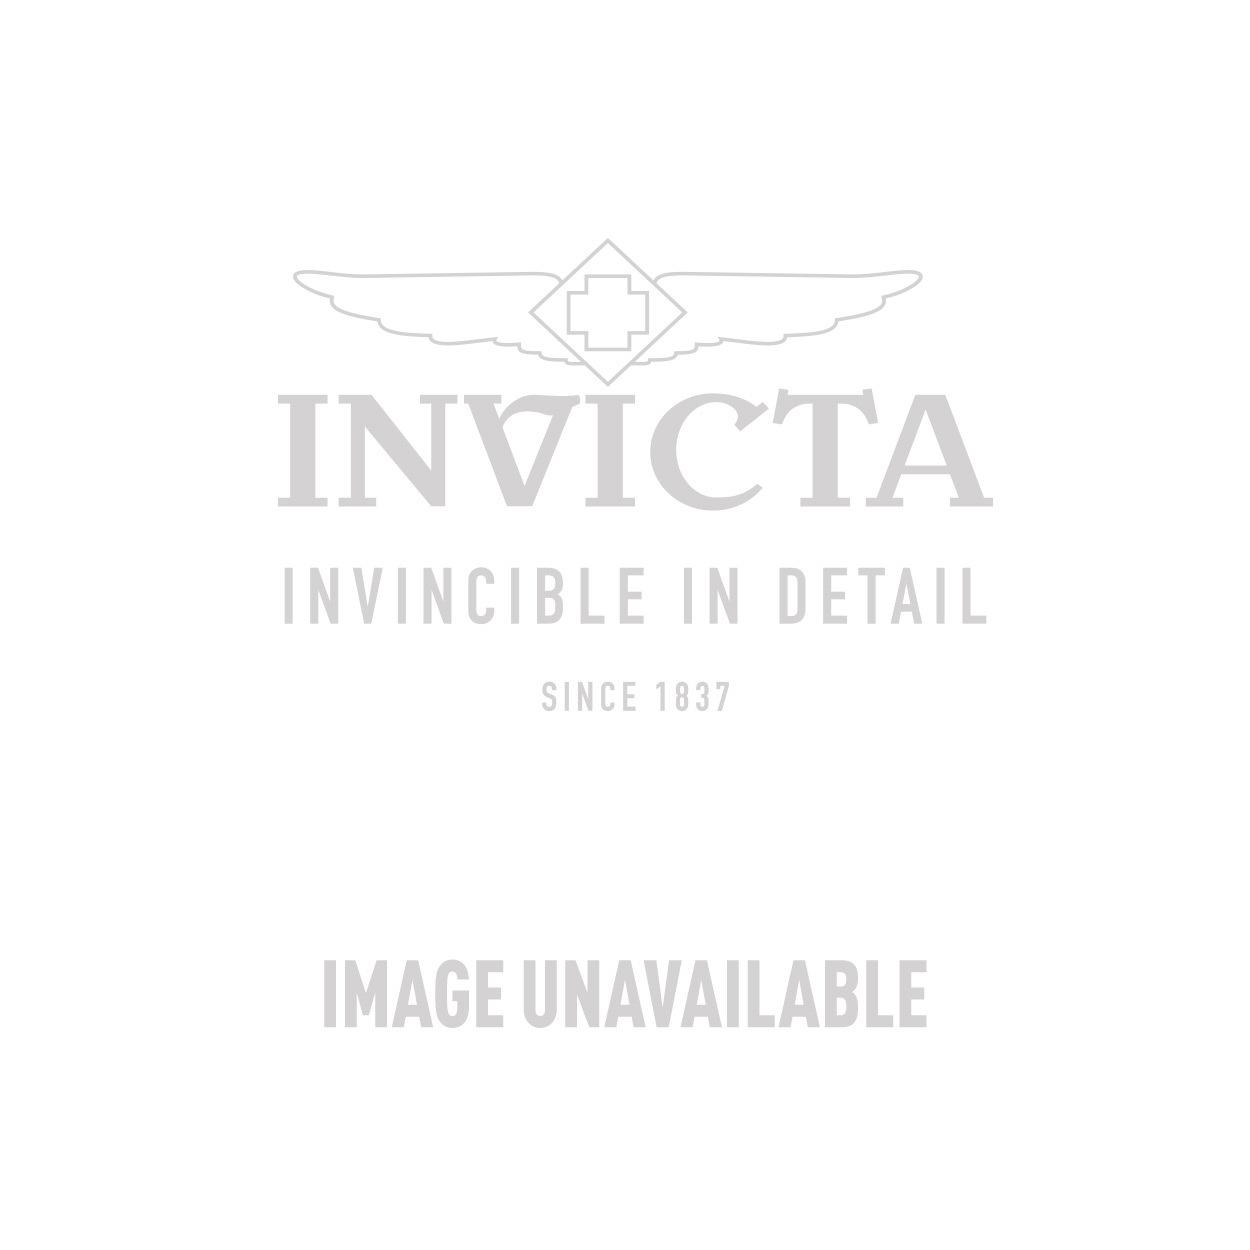 f12ac1f9b Invicta Pro Diver Mens Quartz 50 mm Stainless Steel Case Charcoal ...